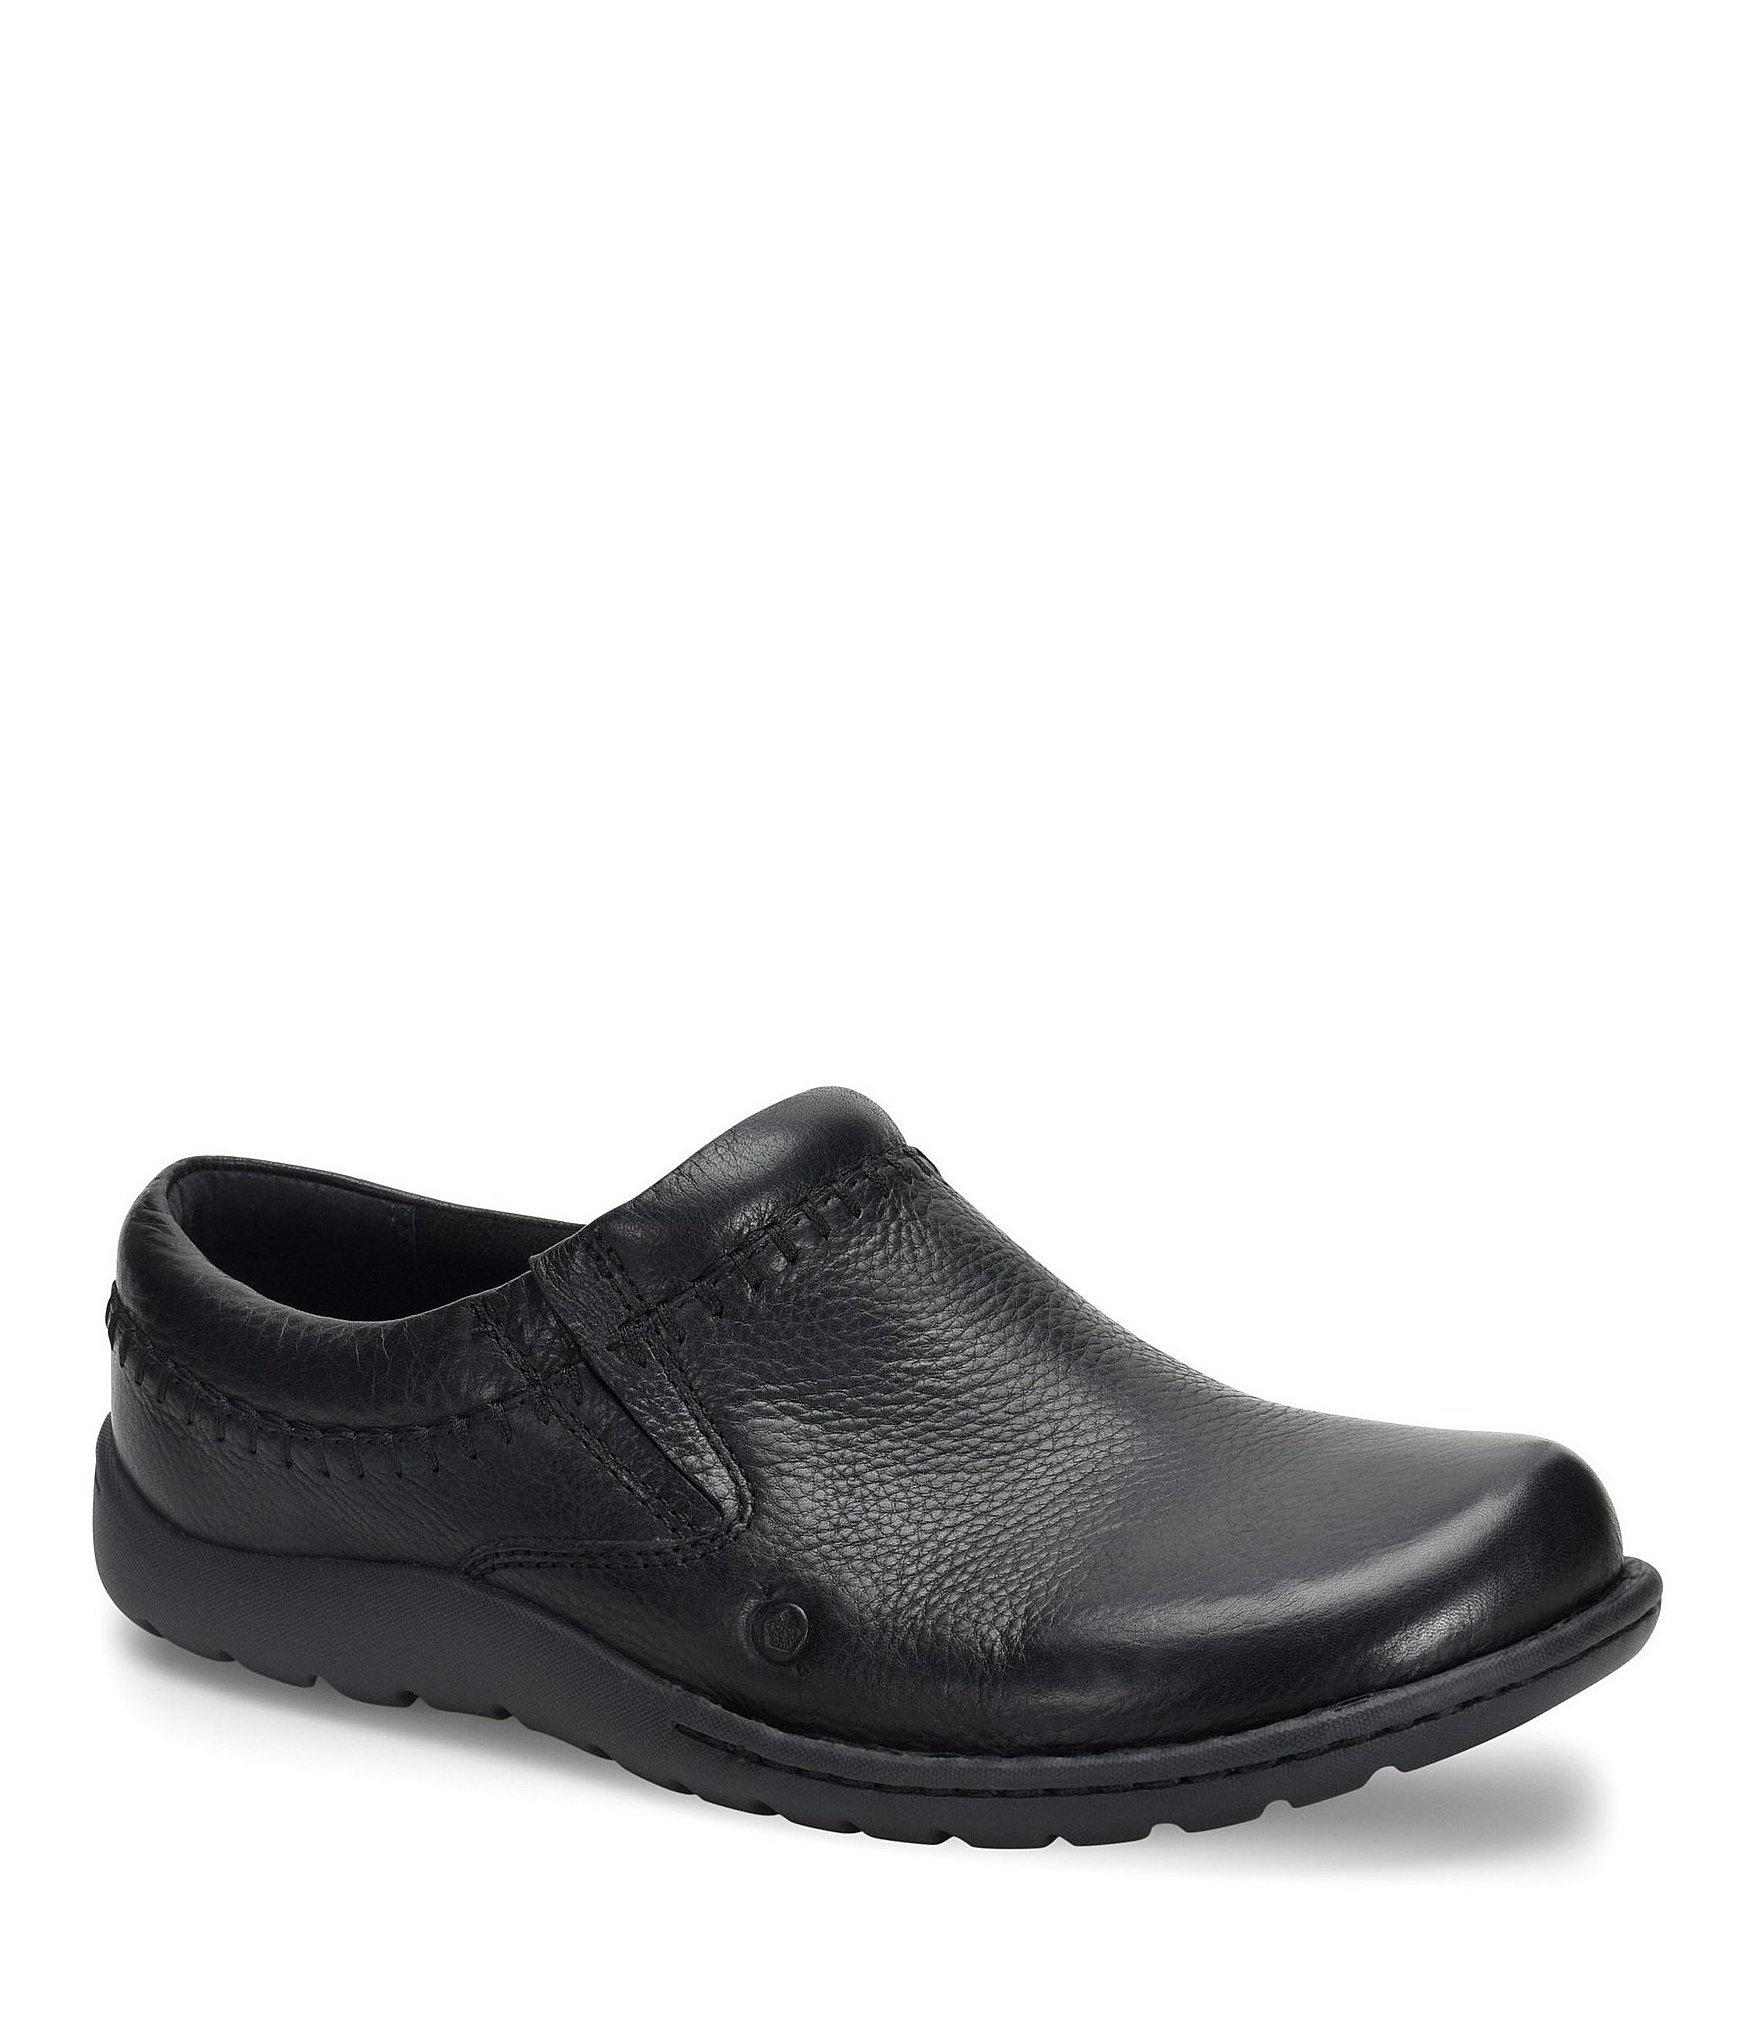 40fba641b66f57 Lyst born mens nigel clogs in black for men jpg 1760x2040 Black men born  shoes